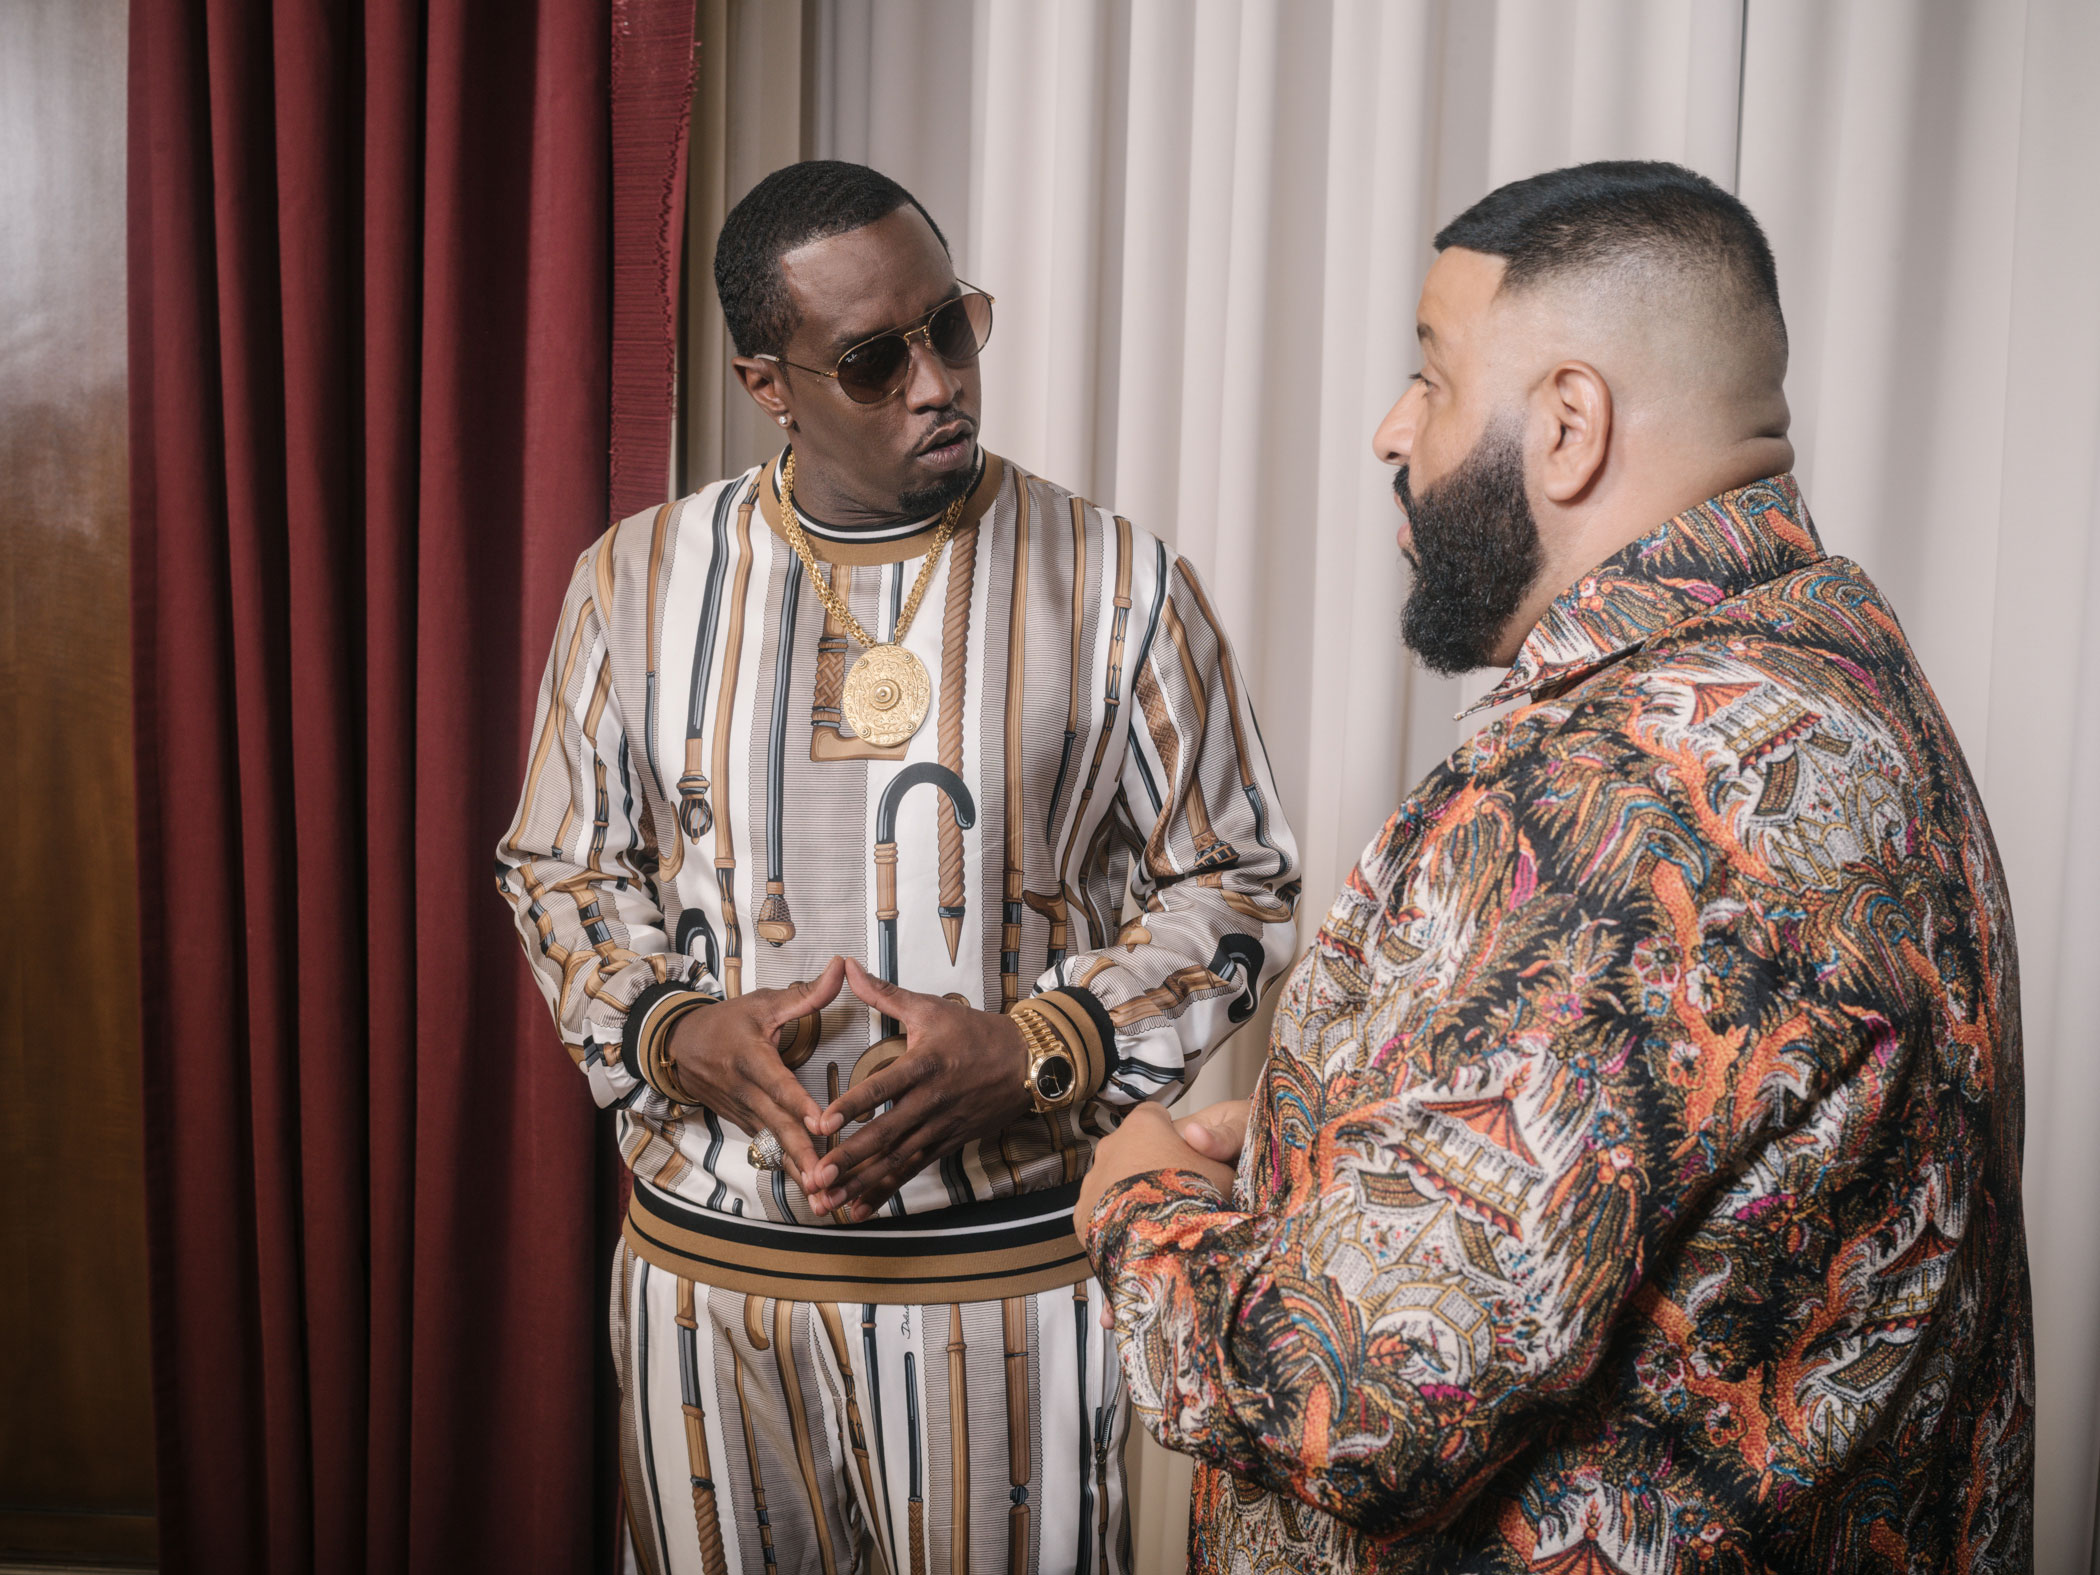 Wayne Lawrence Rolling Stone - P Diddy + DJ Khaled